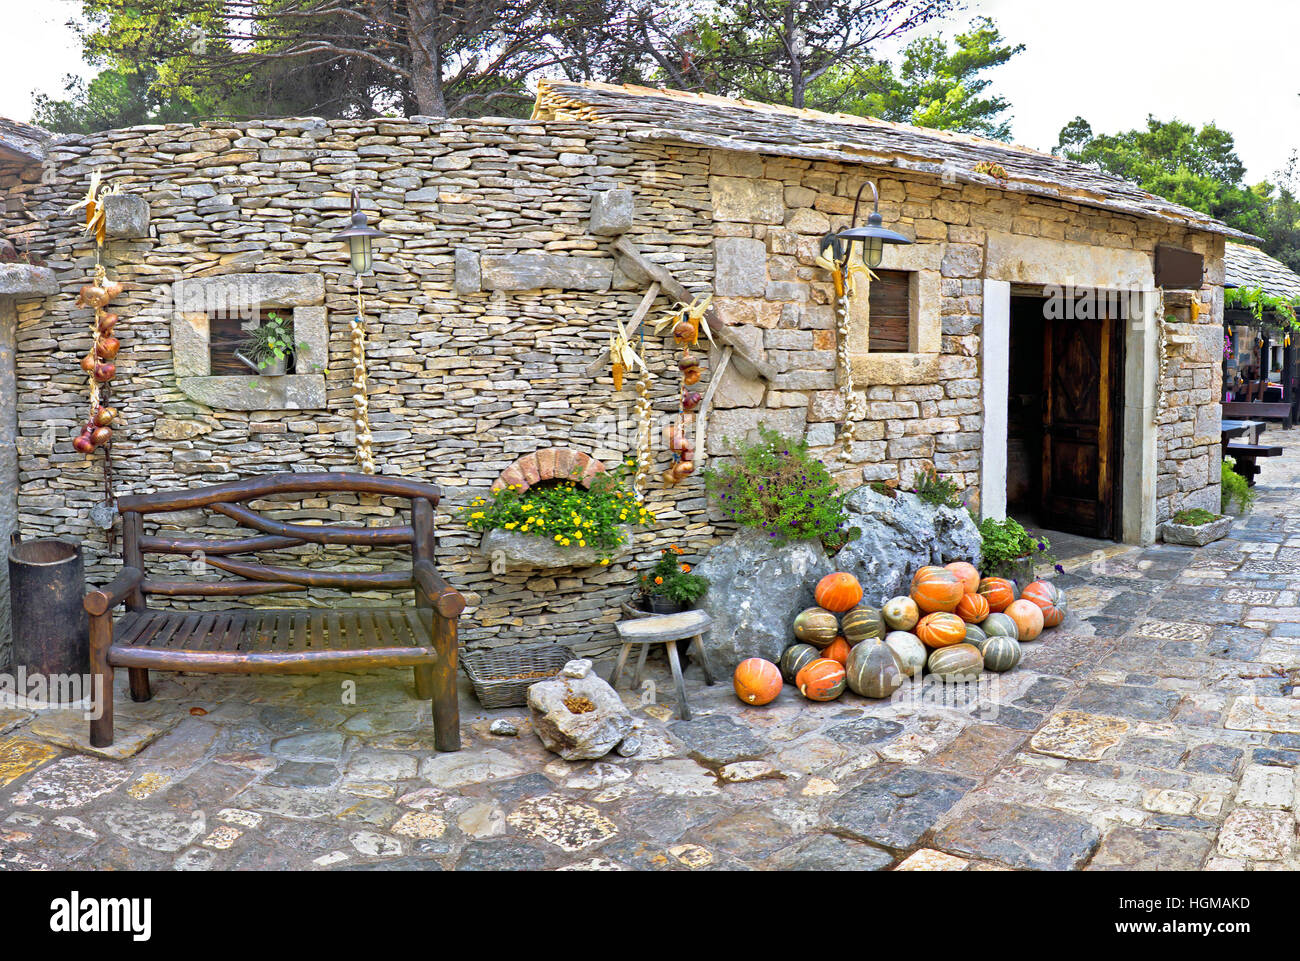 Dalmatian old stone village street, Croatia - Stock Image